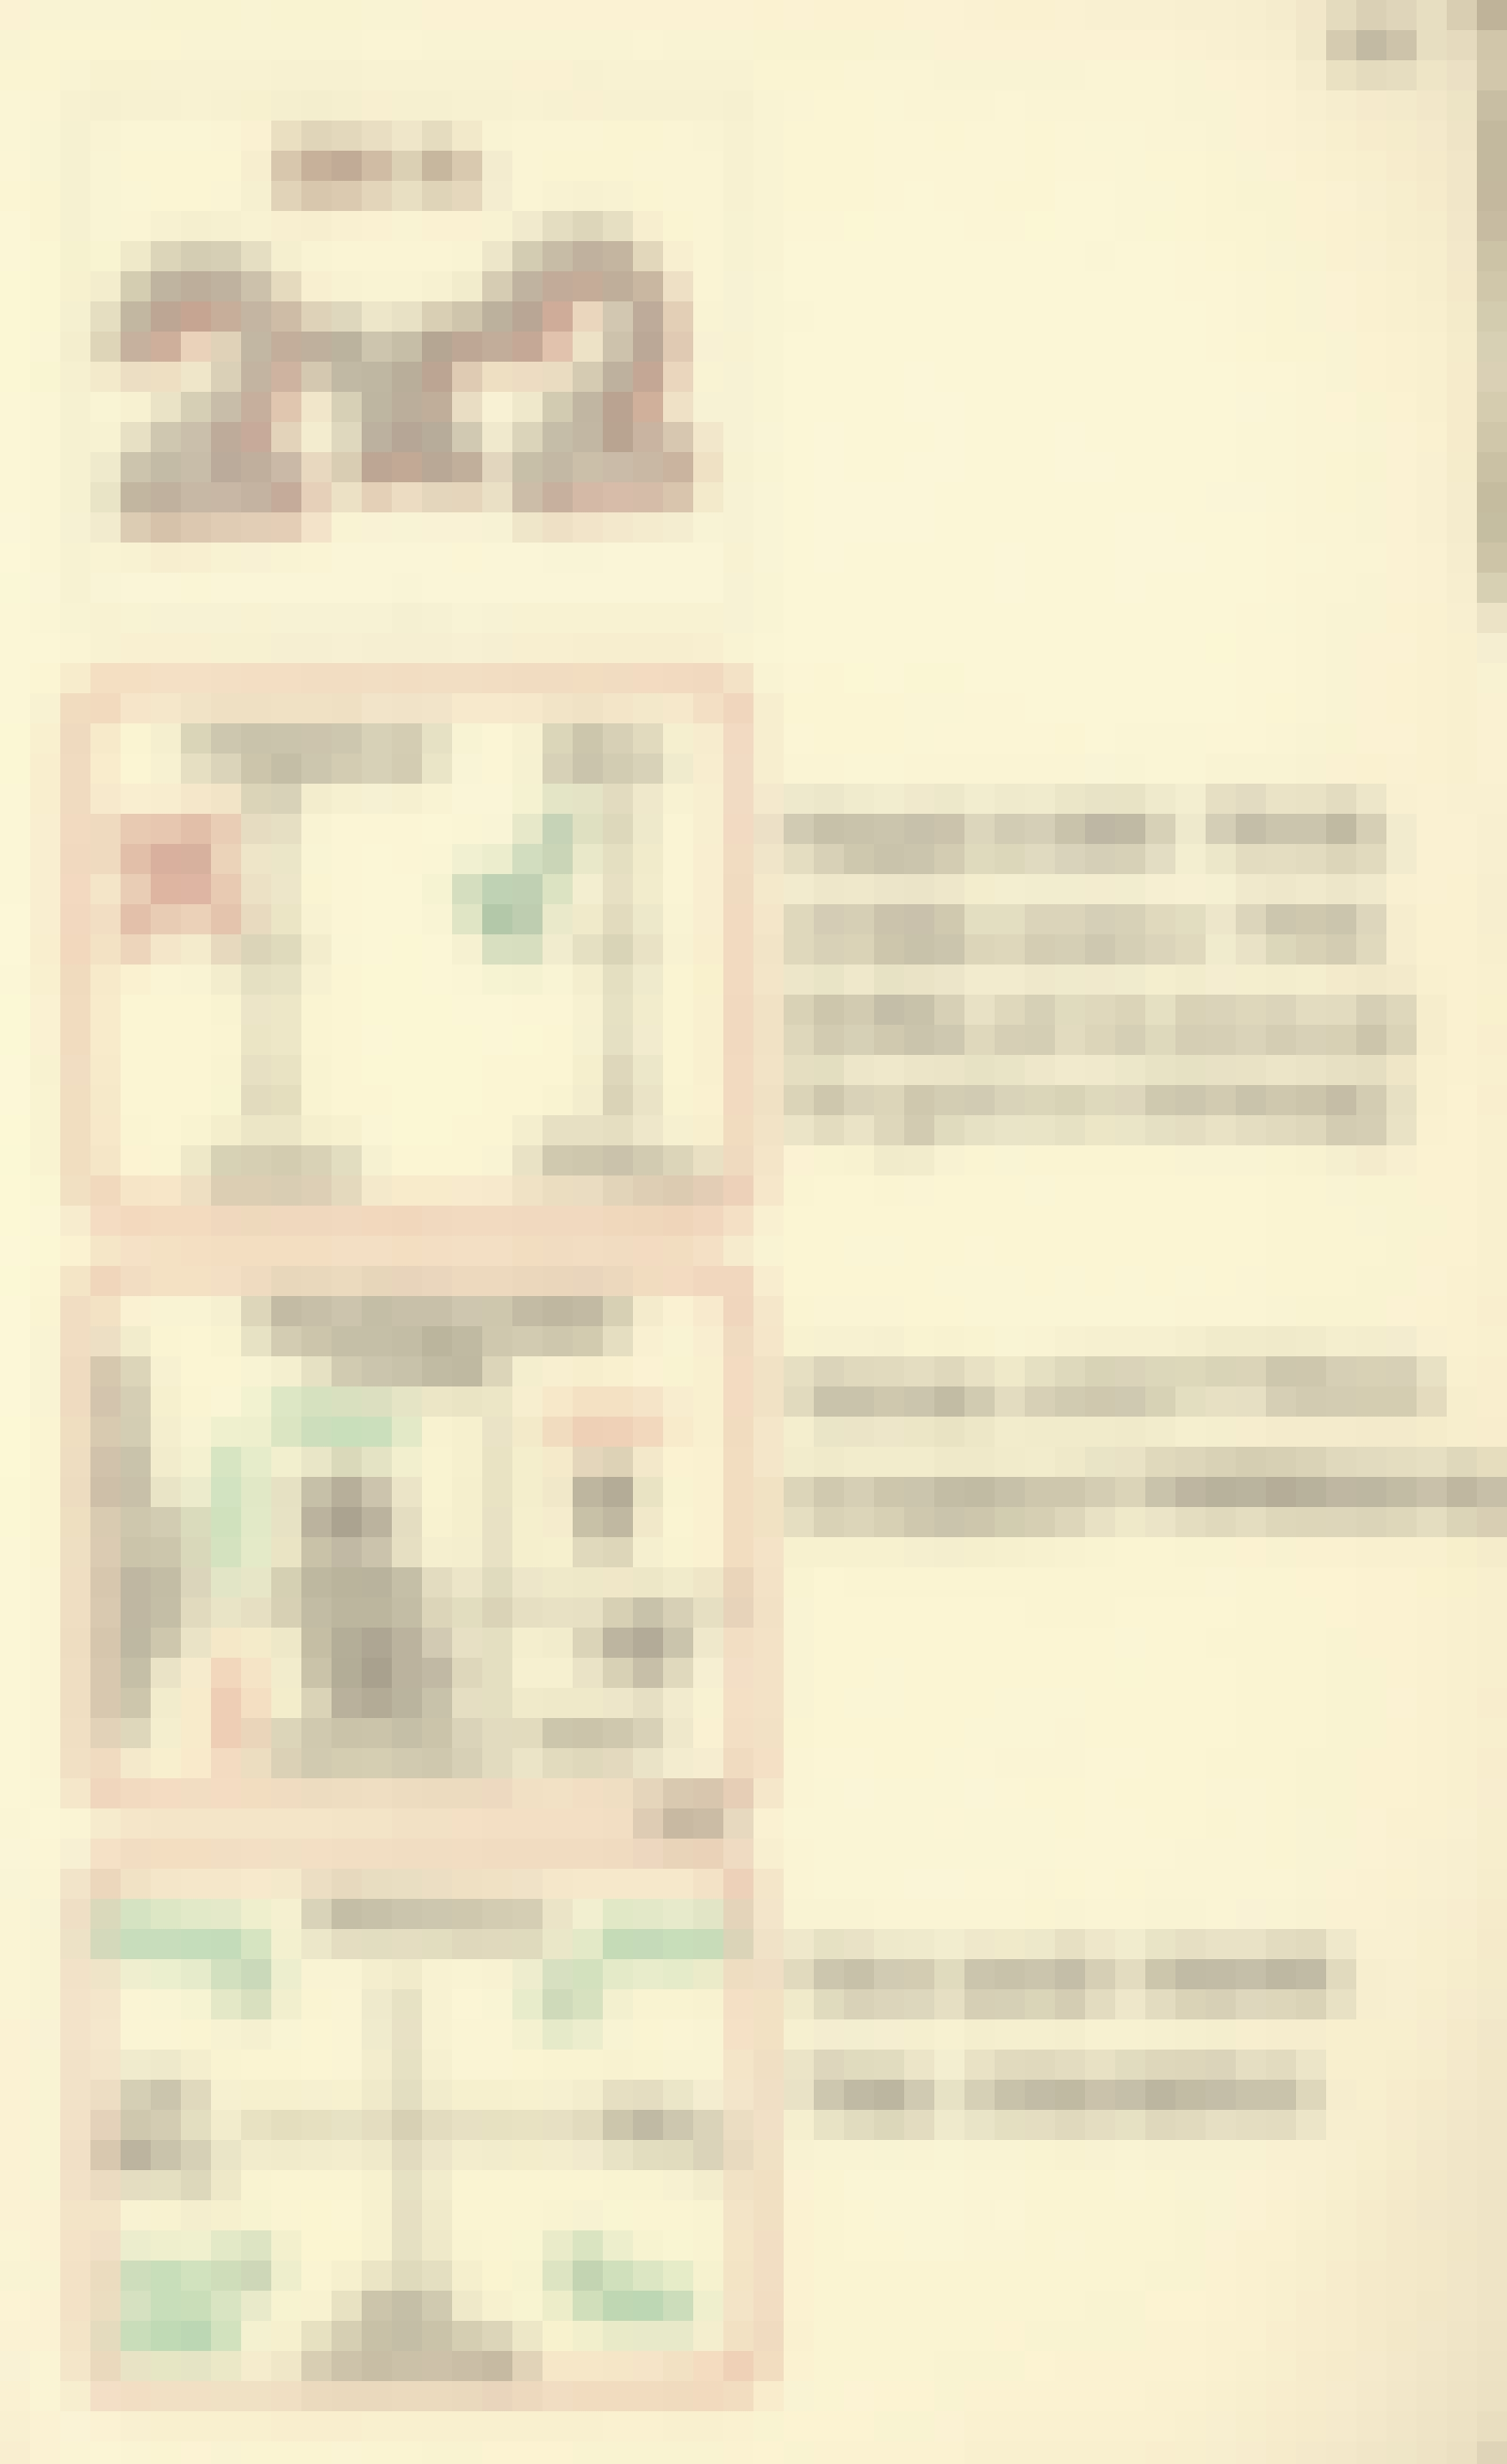 Do a 2x2 - Sketchplanations